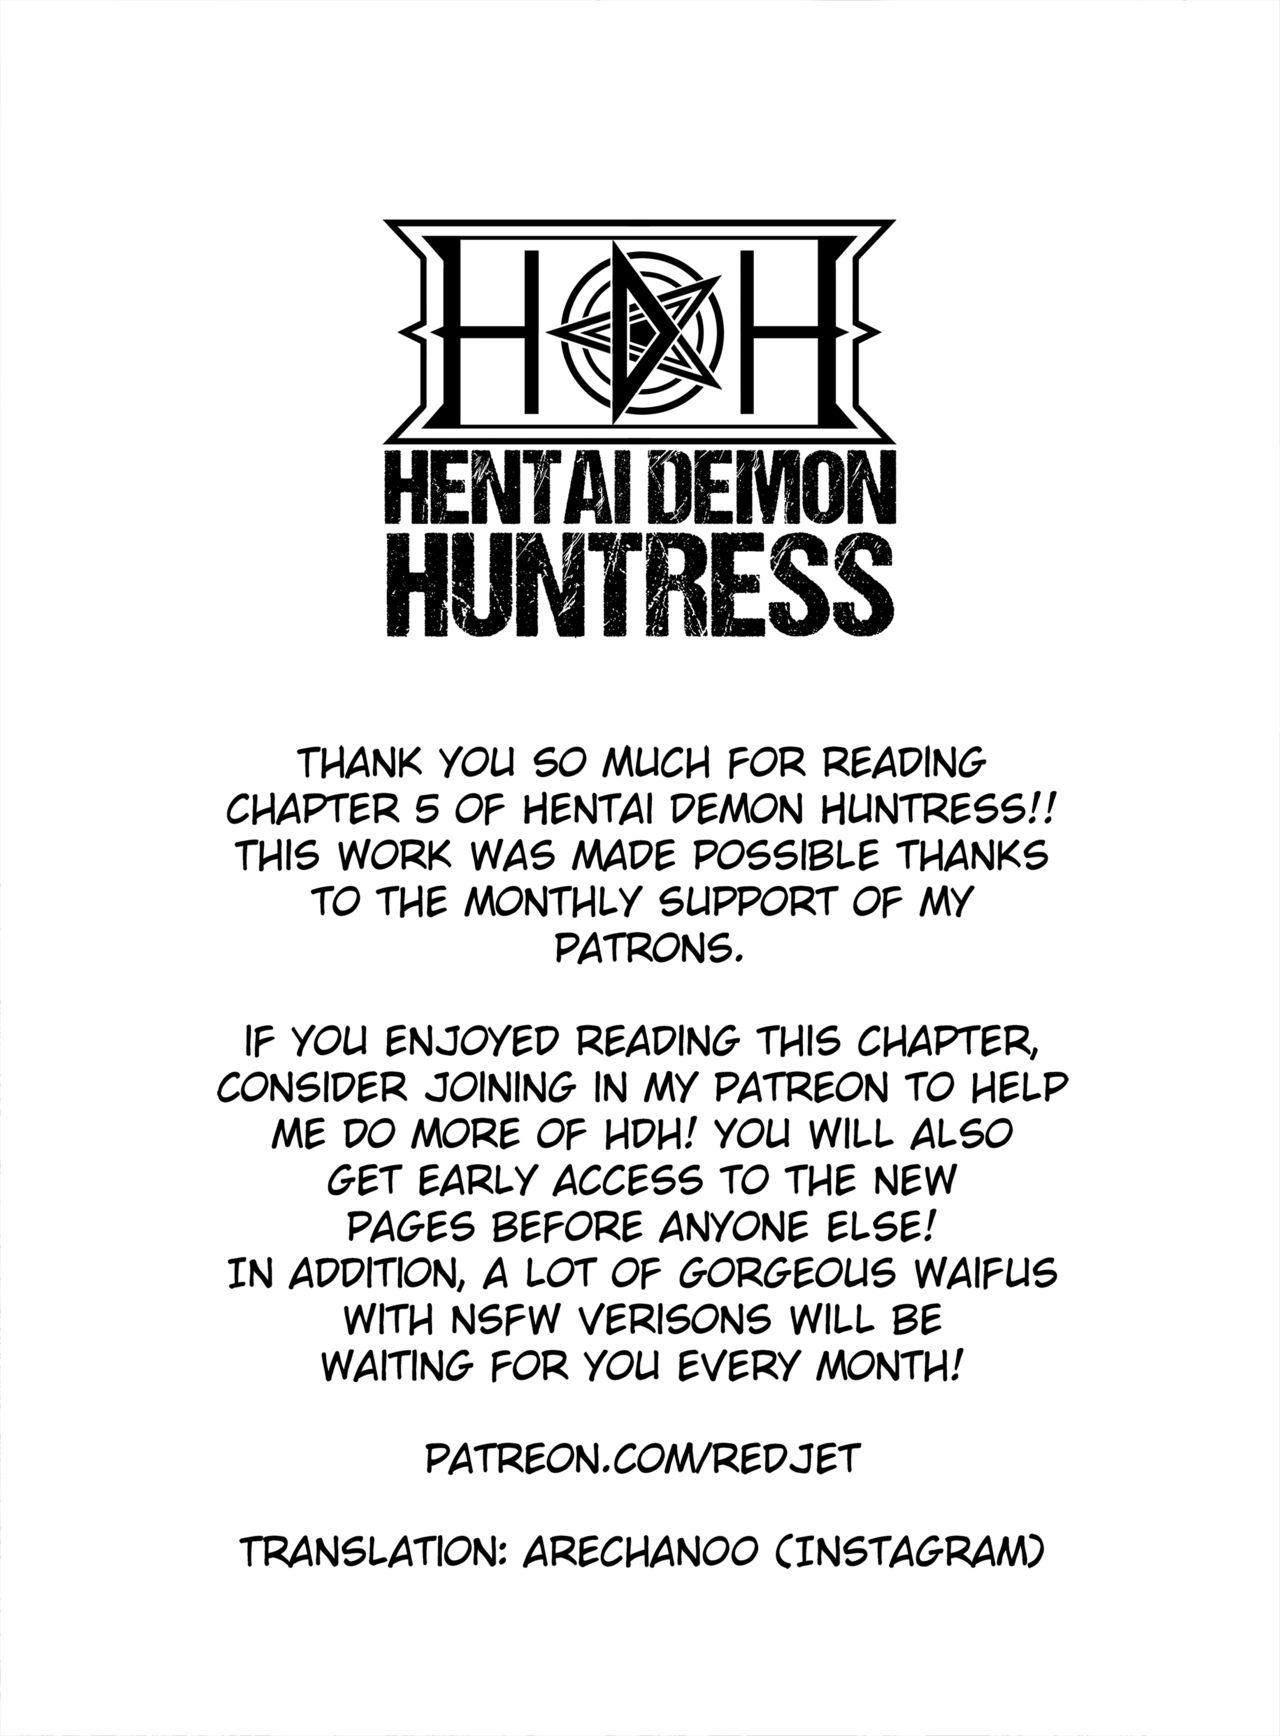 Hentai Demon Huntress Chapter 5 Redjet 21